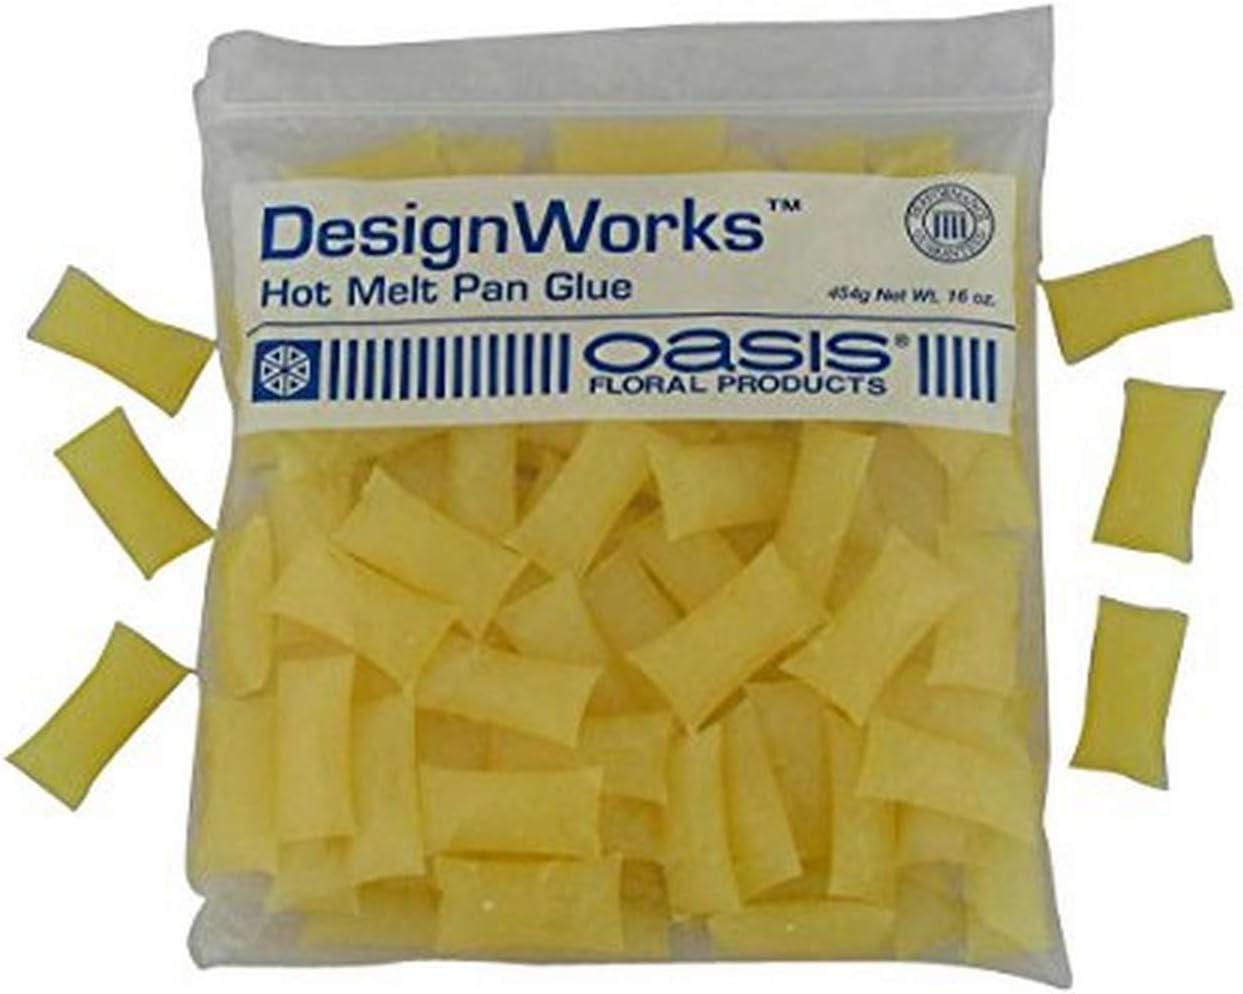 Oasis Design Works Hot Melt Glue Pillows 16 Ounce Bag